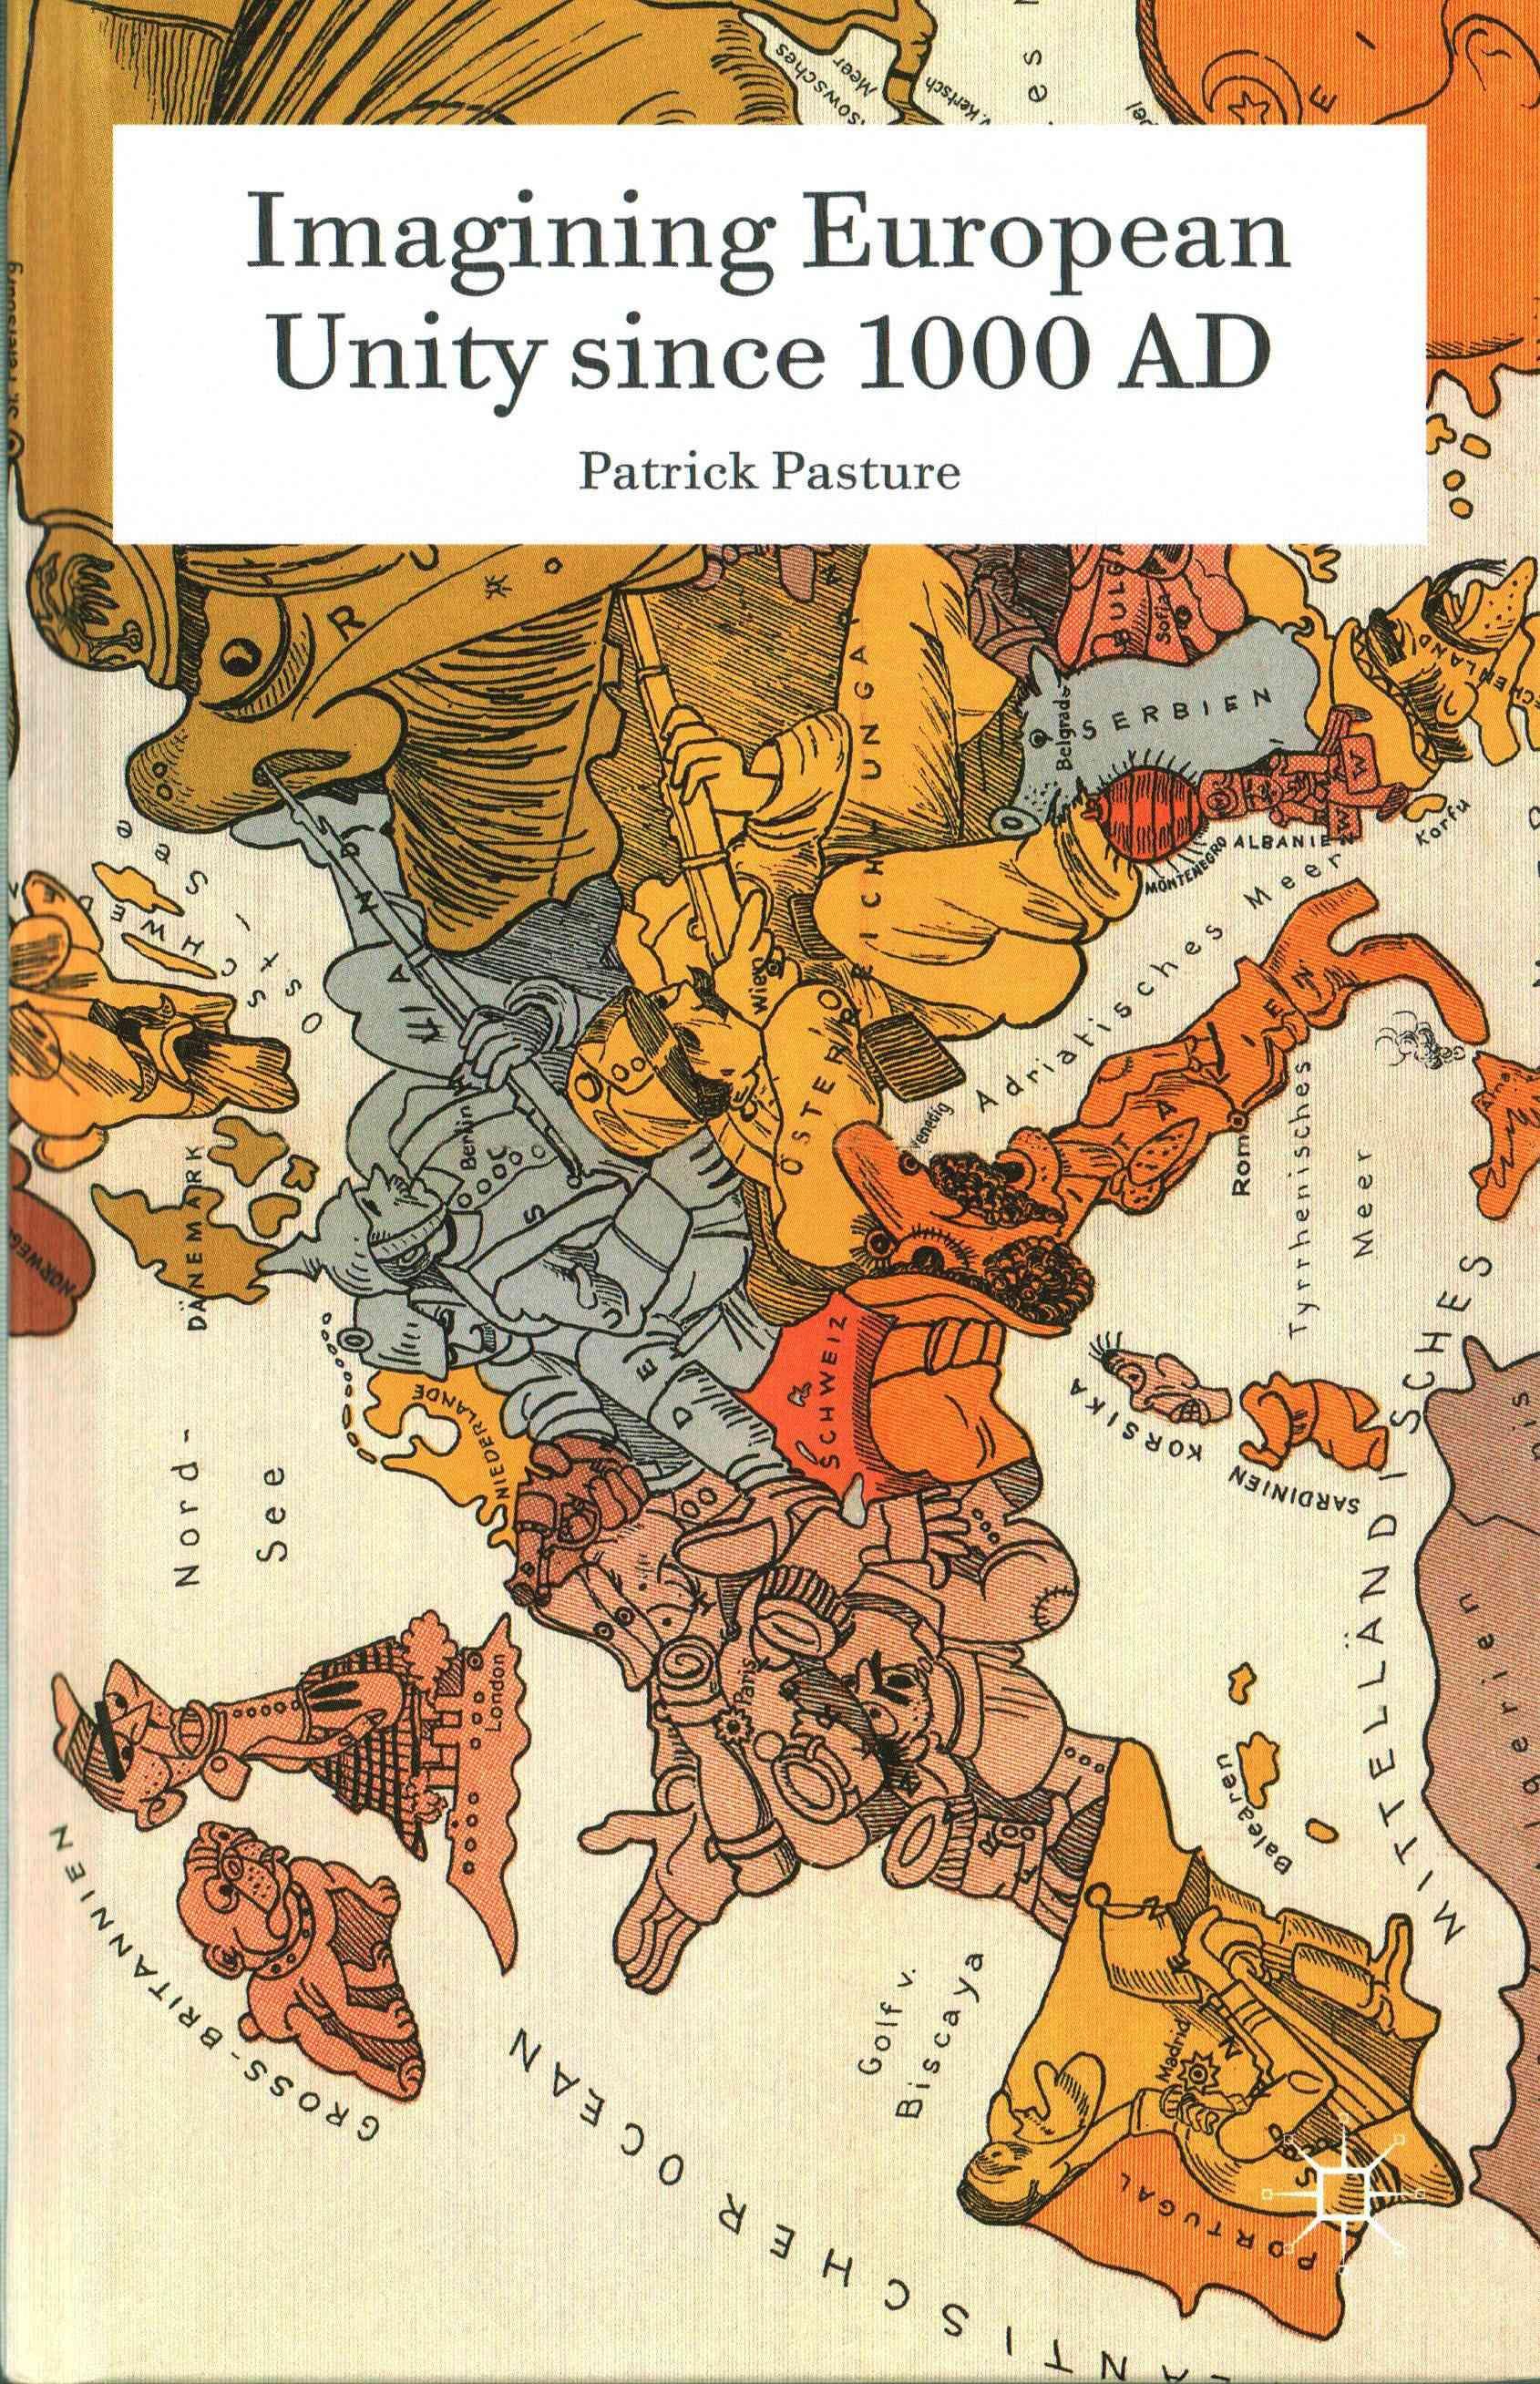 Imagining European Unity since 1000 AD